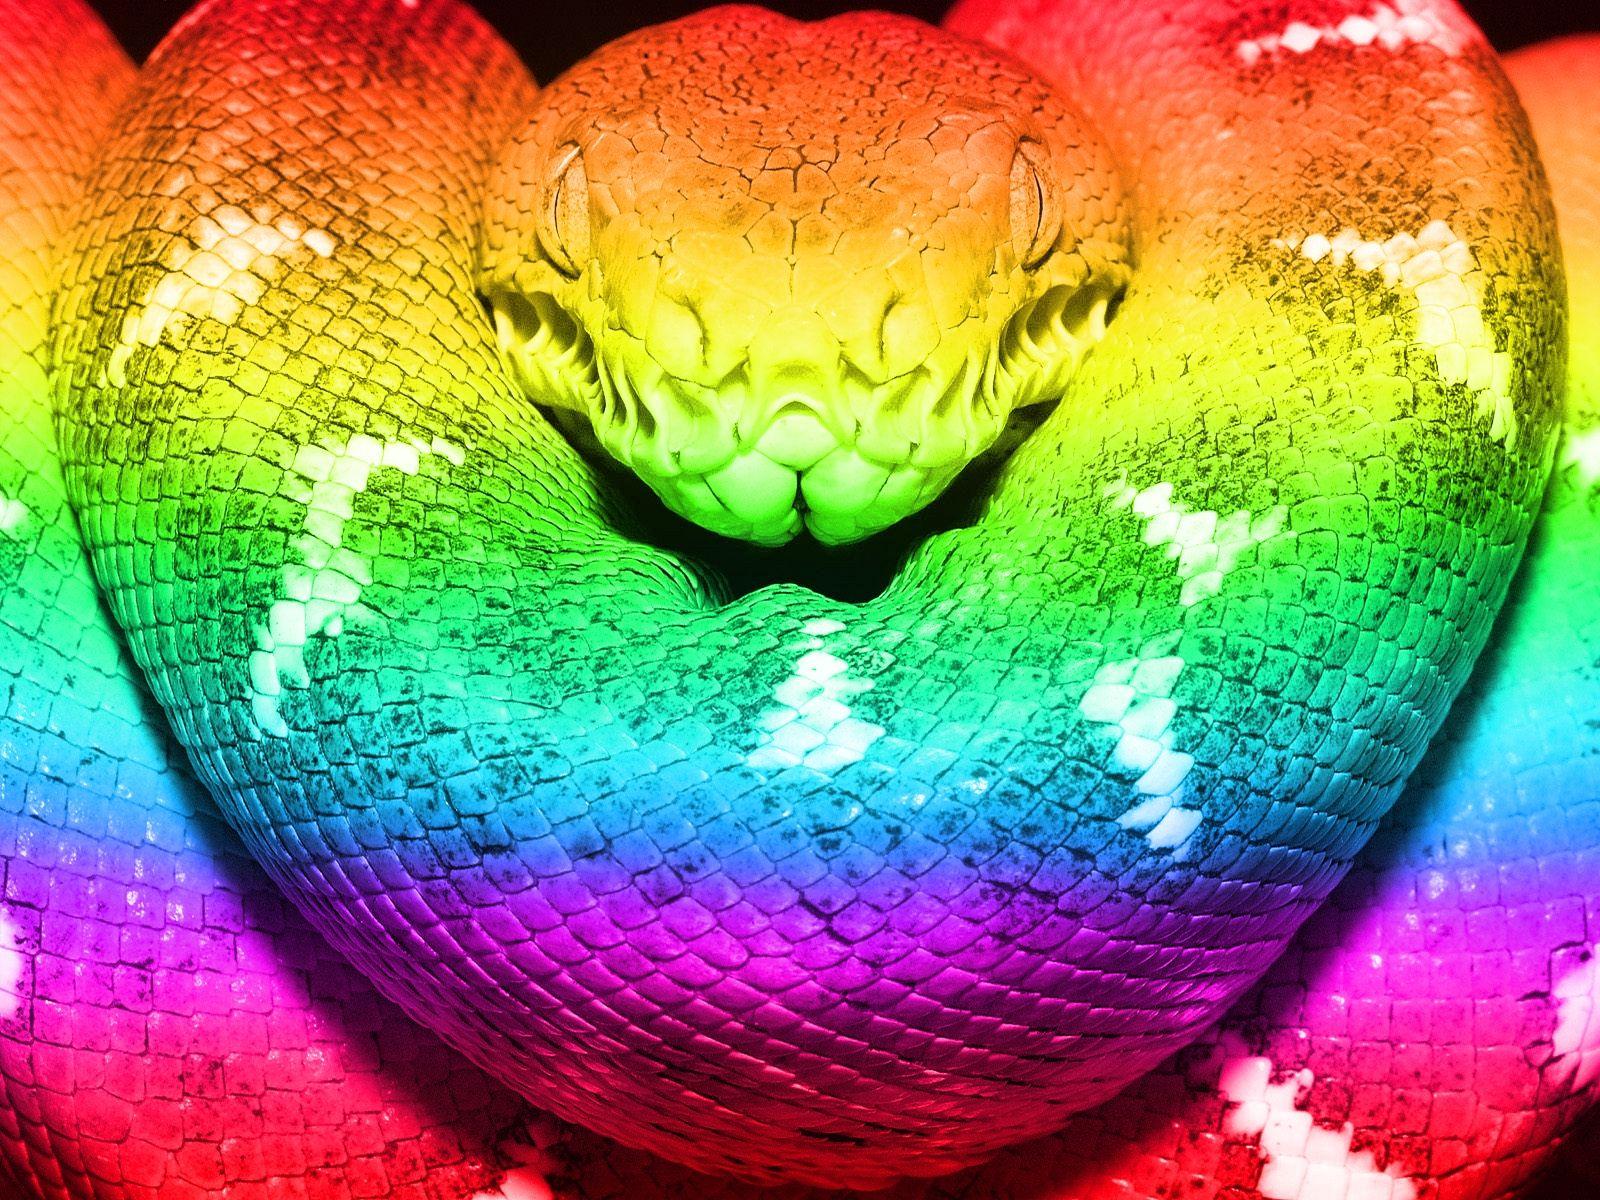 Rainbow Boa Color Rainbow Snake Wow With Images Rainbow Snake